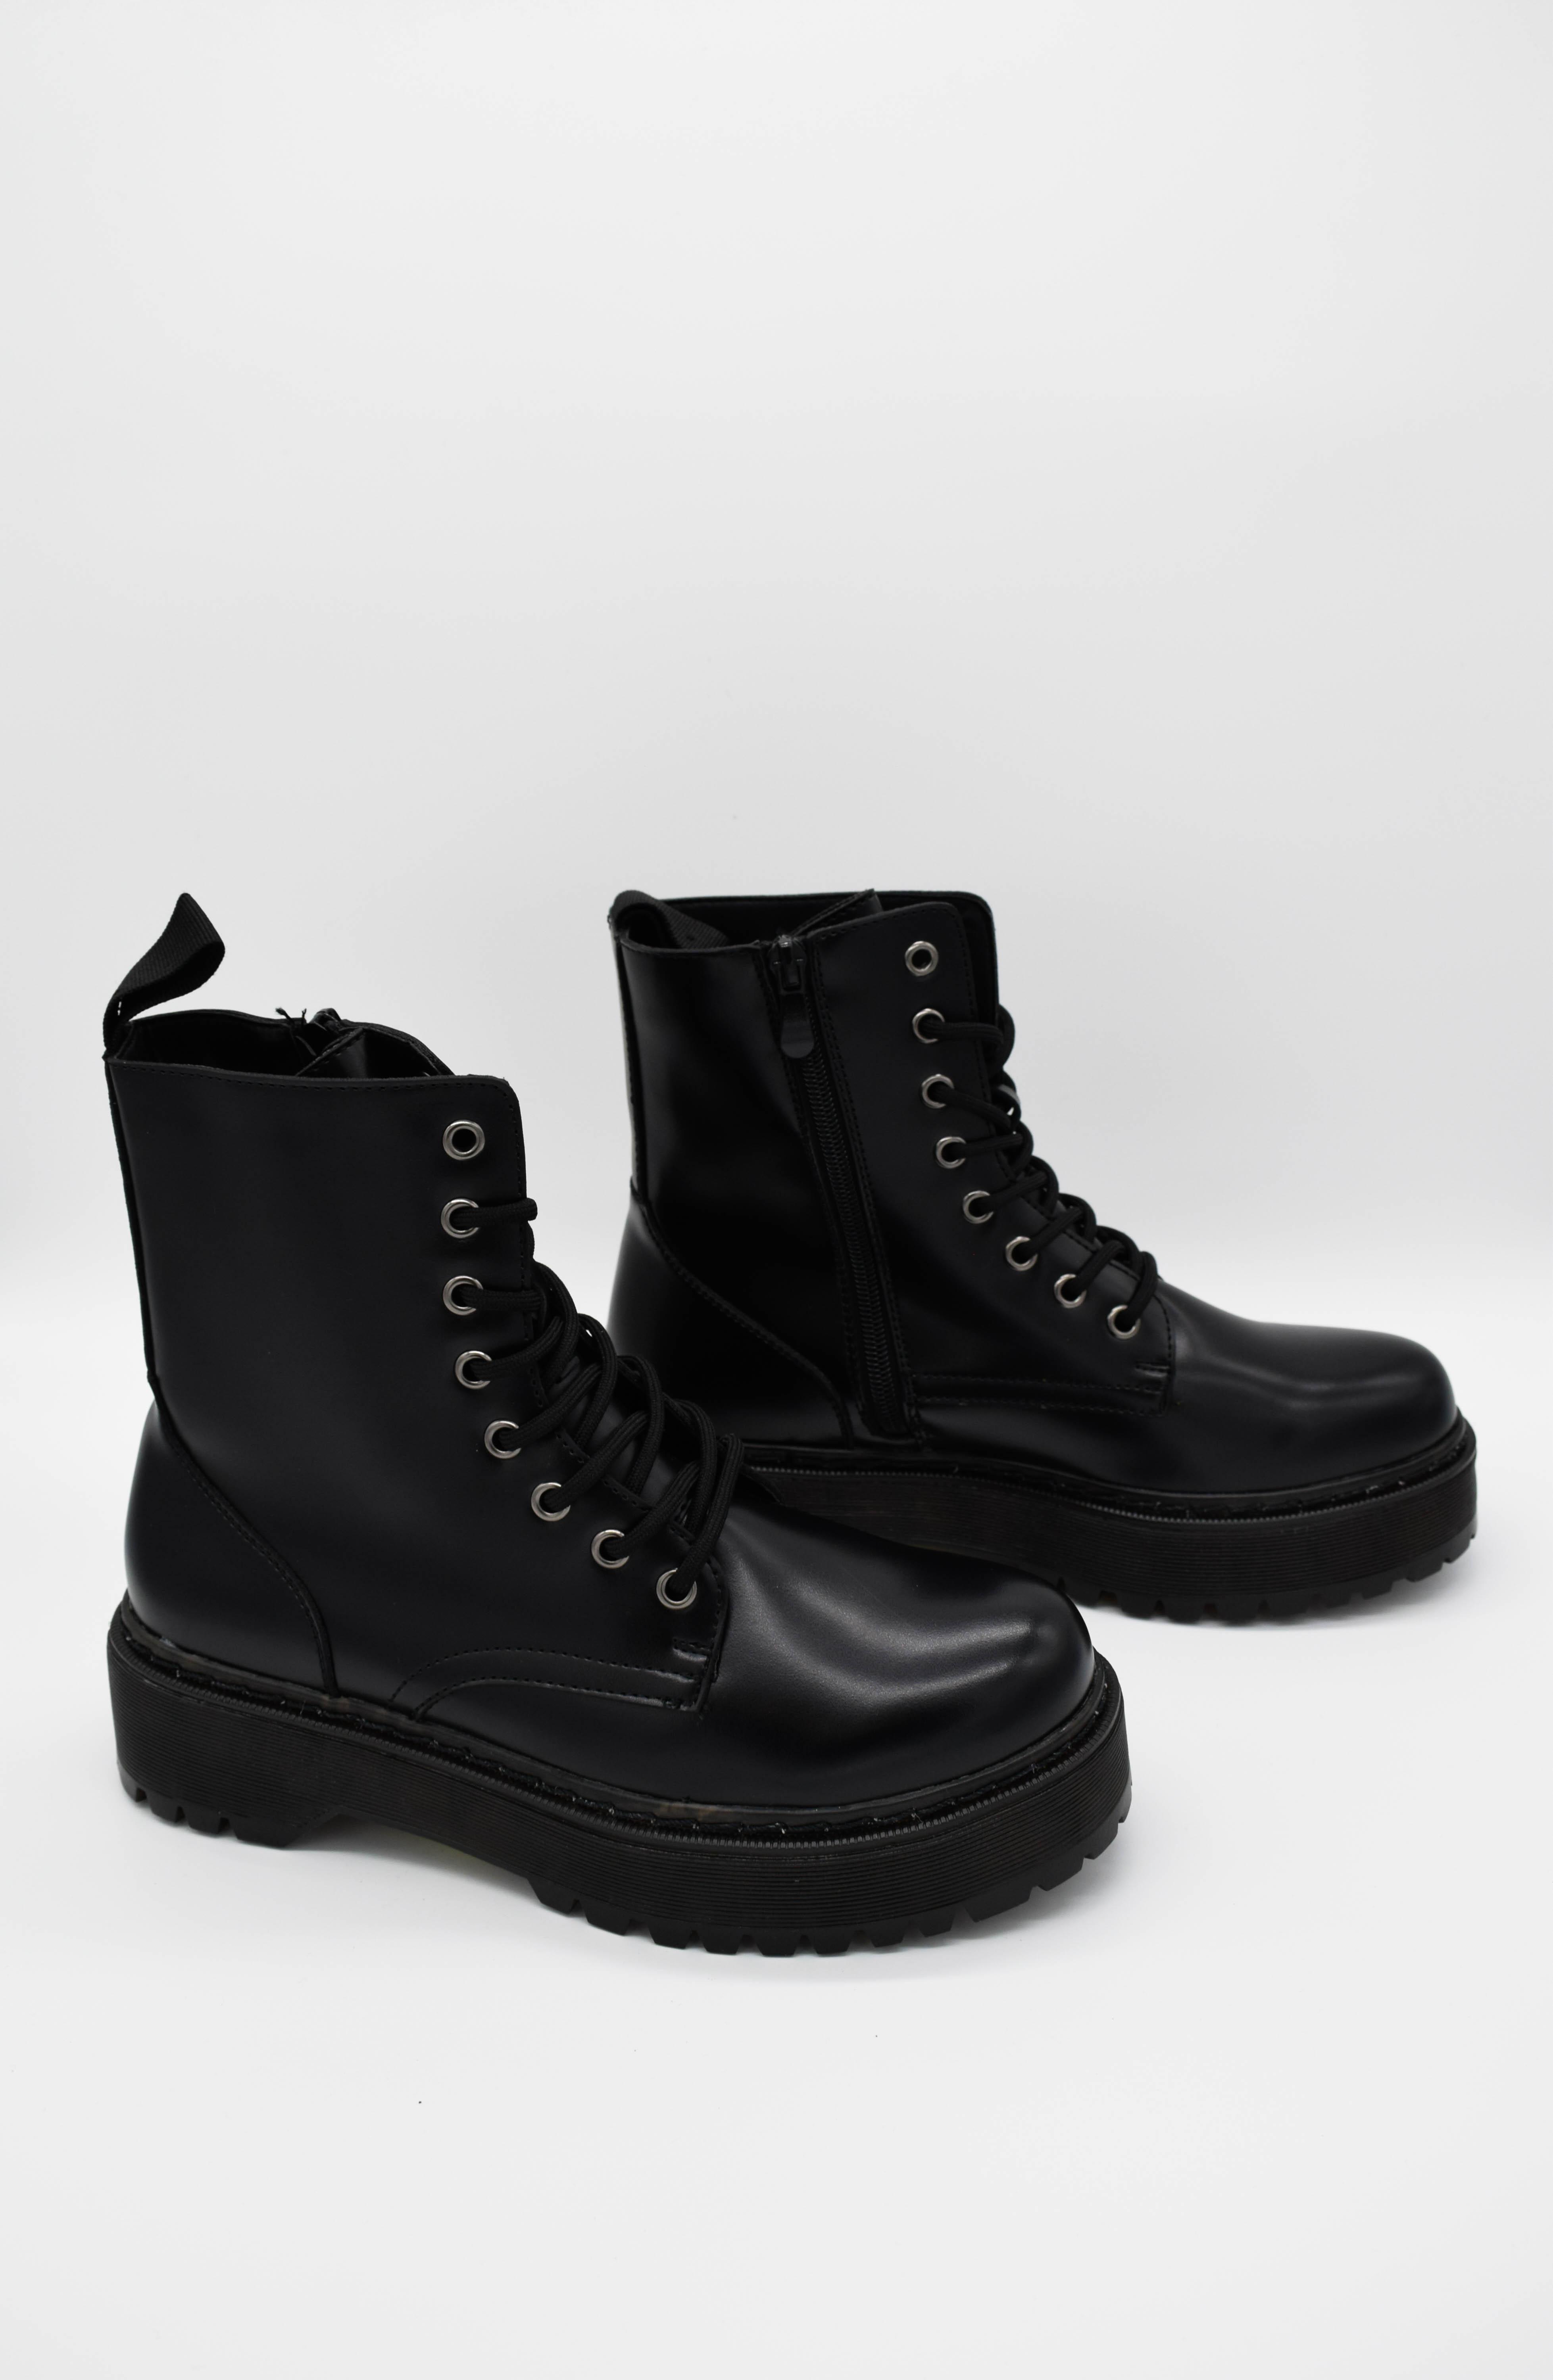 Boots schwarz mit Plateausohle